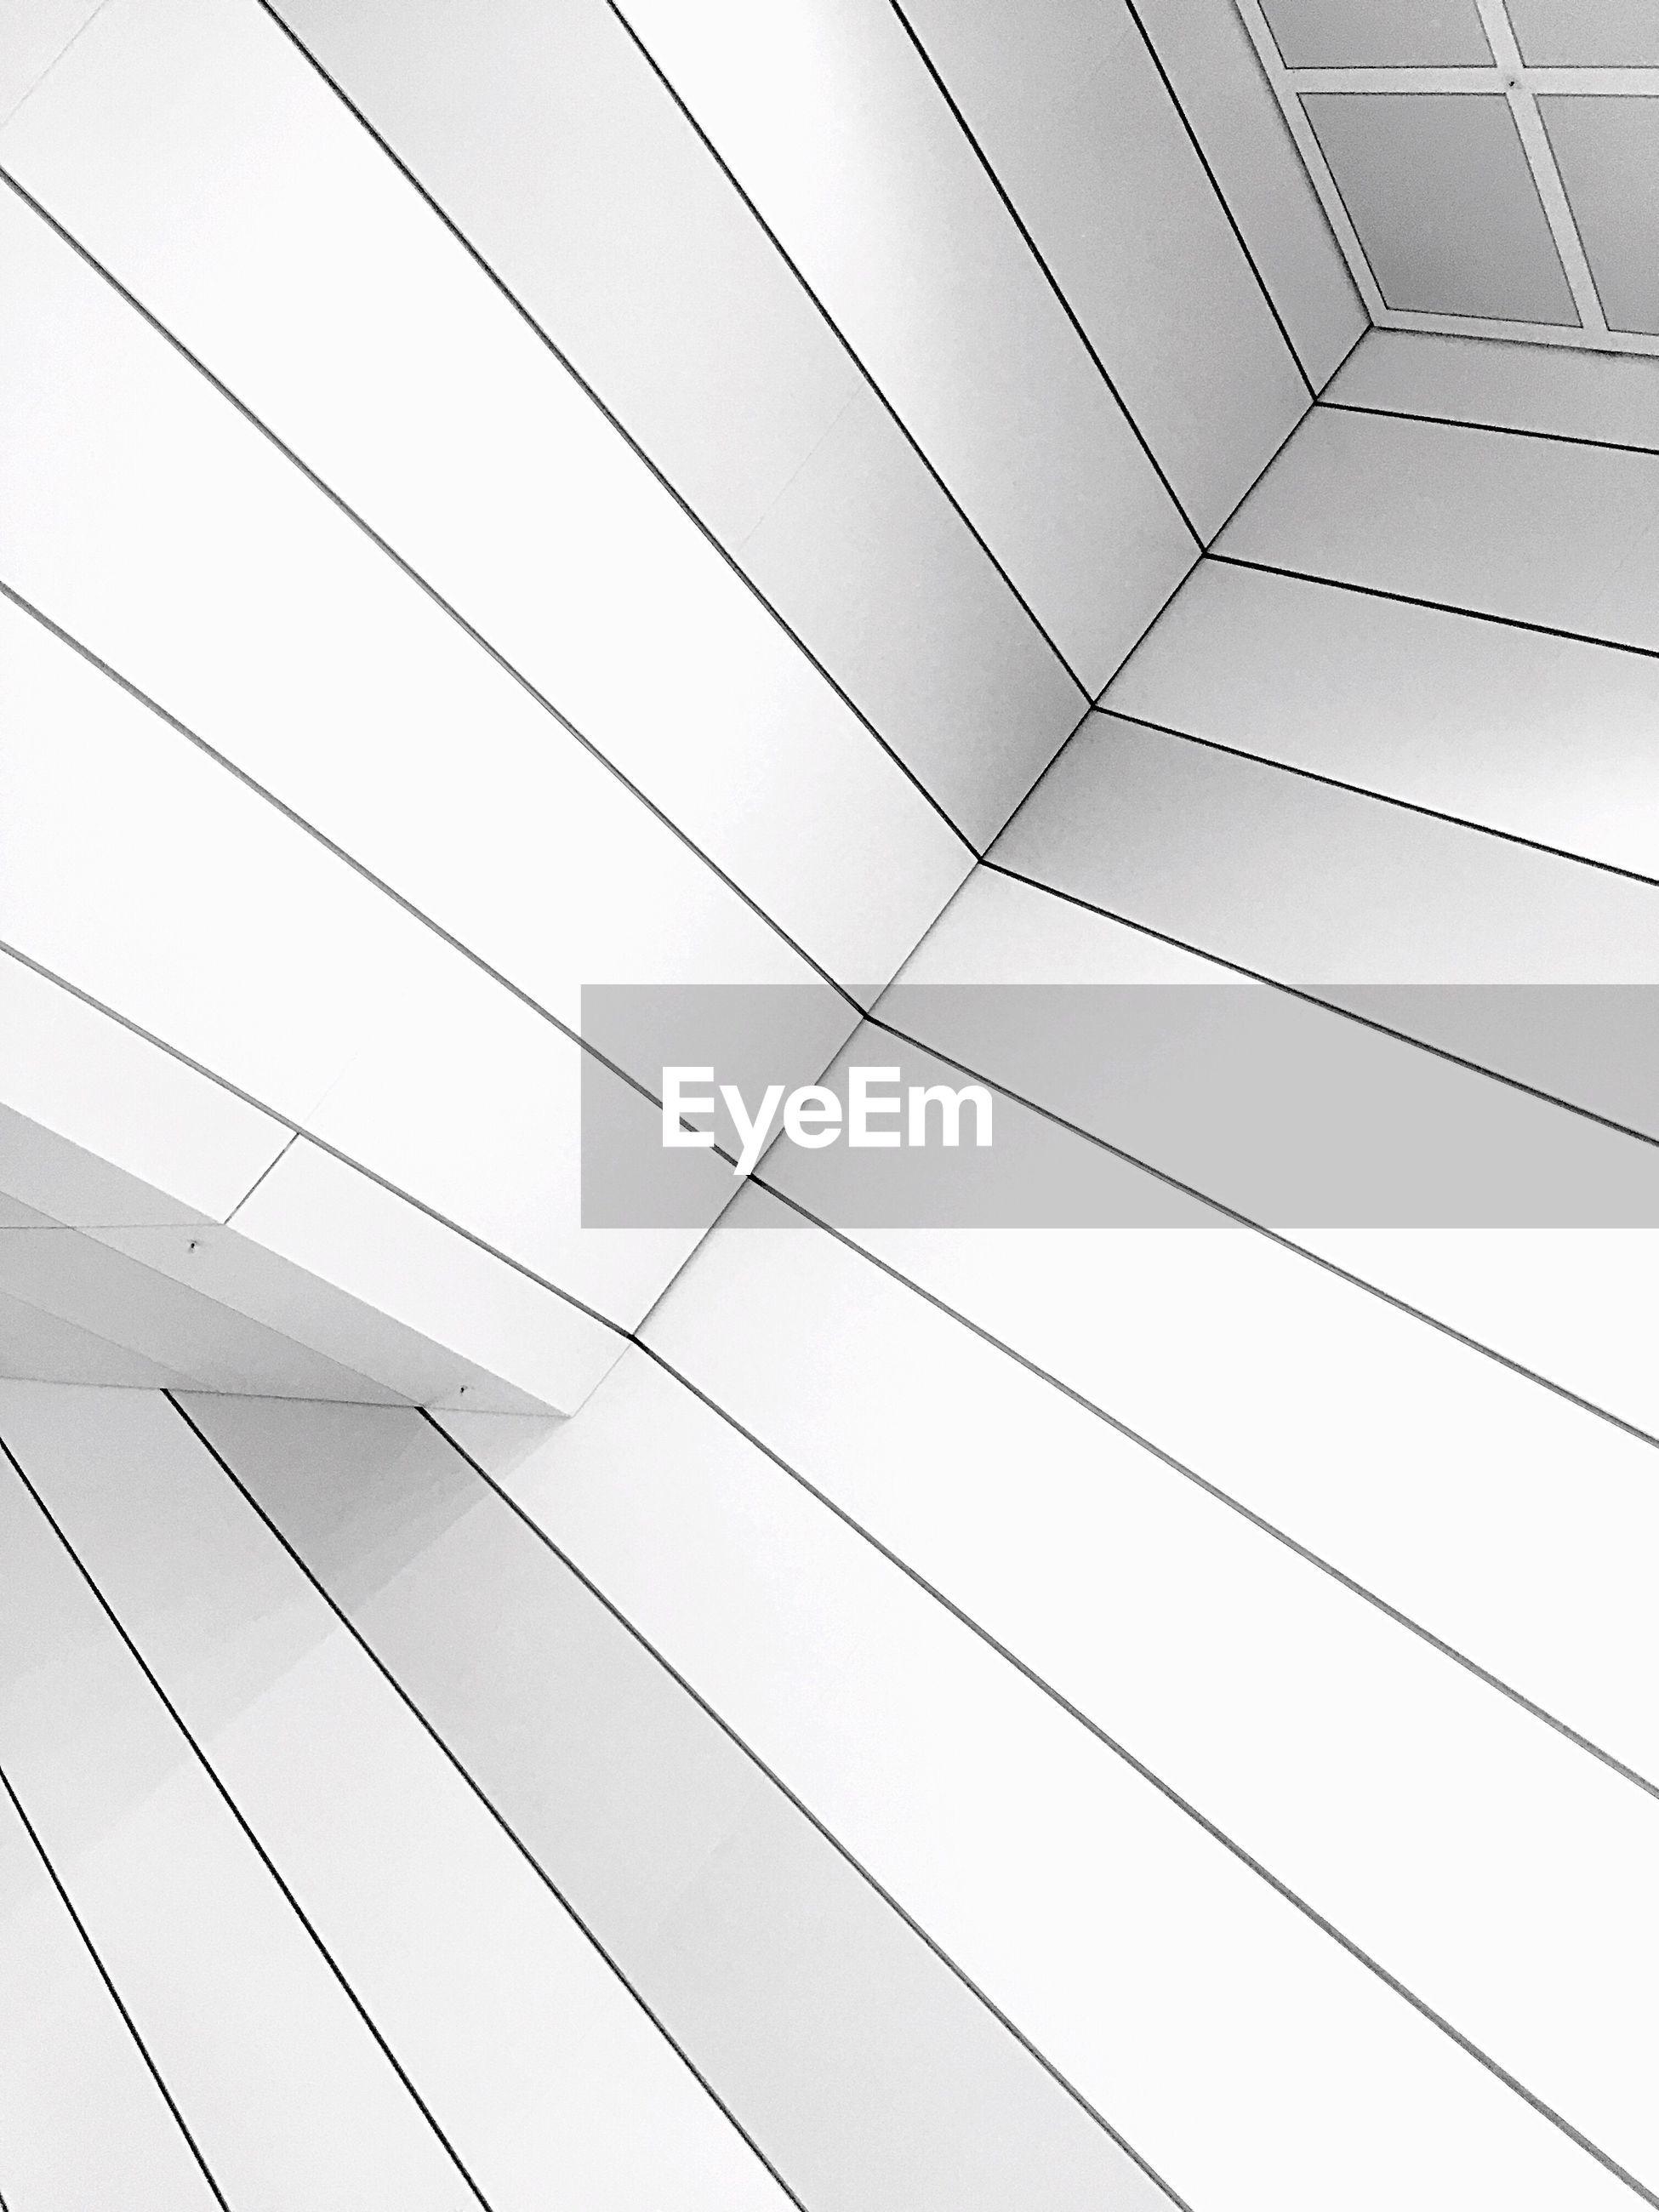 Full frame shot of architectural pattern